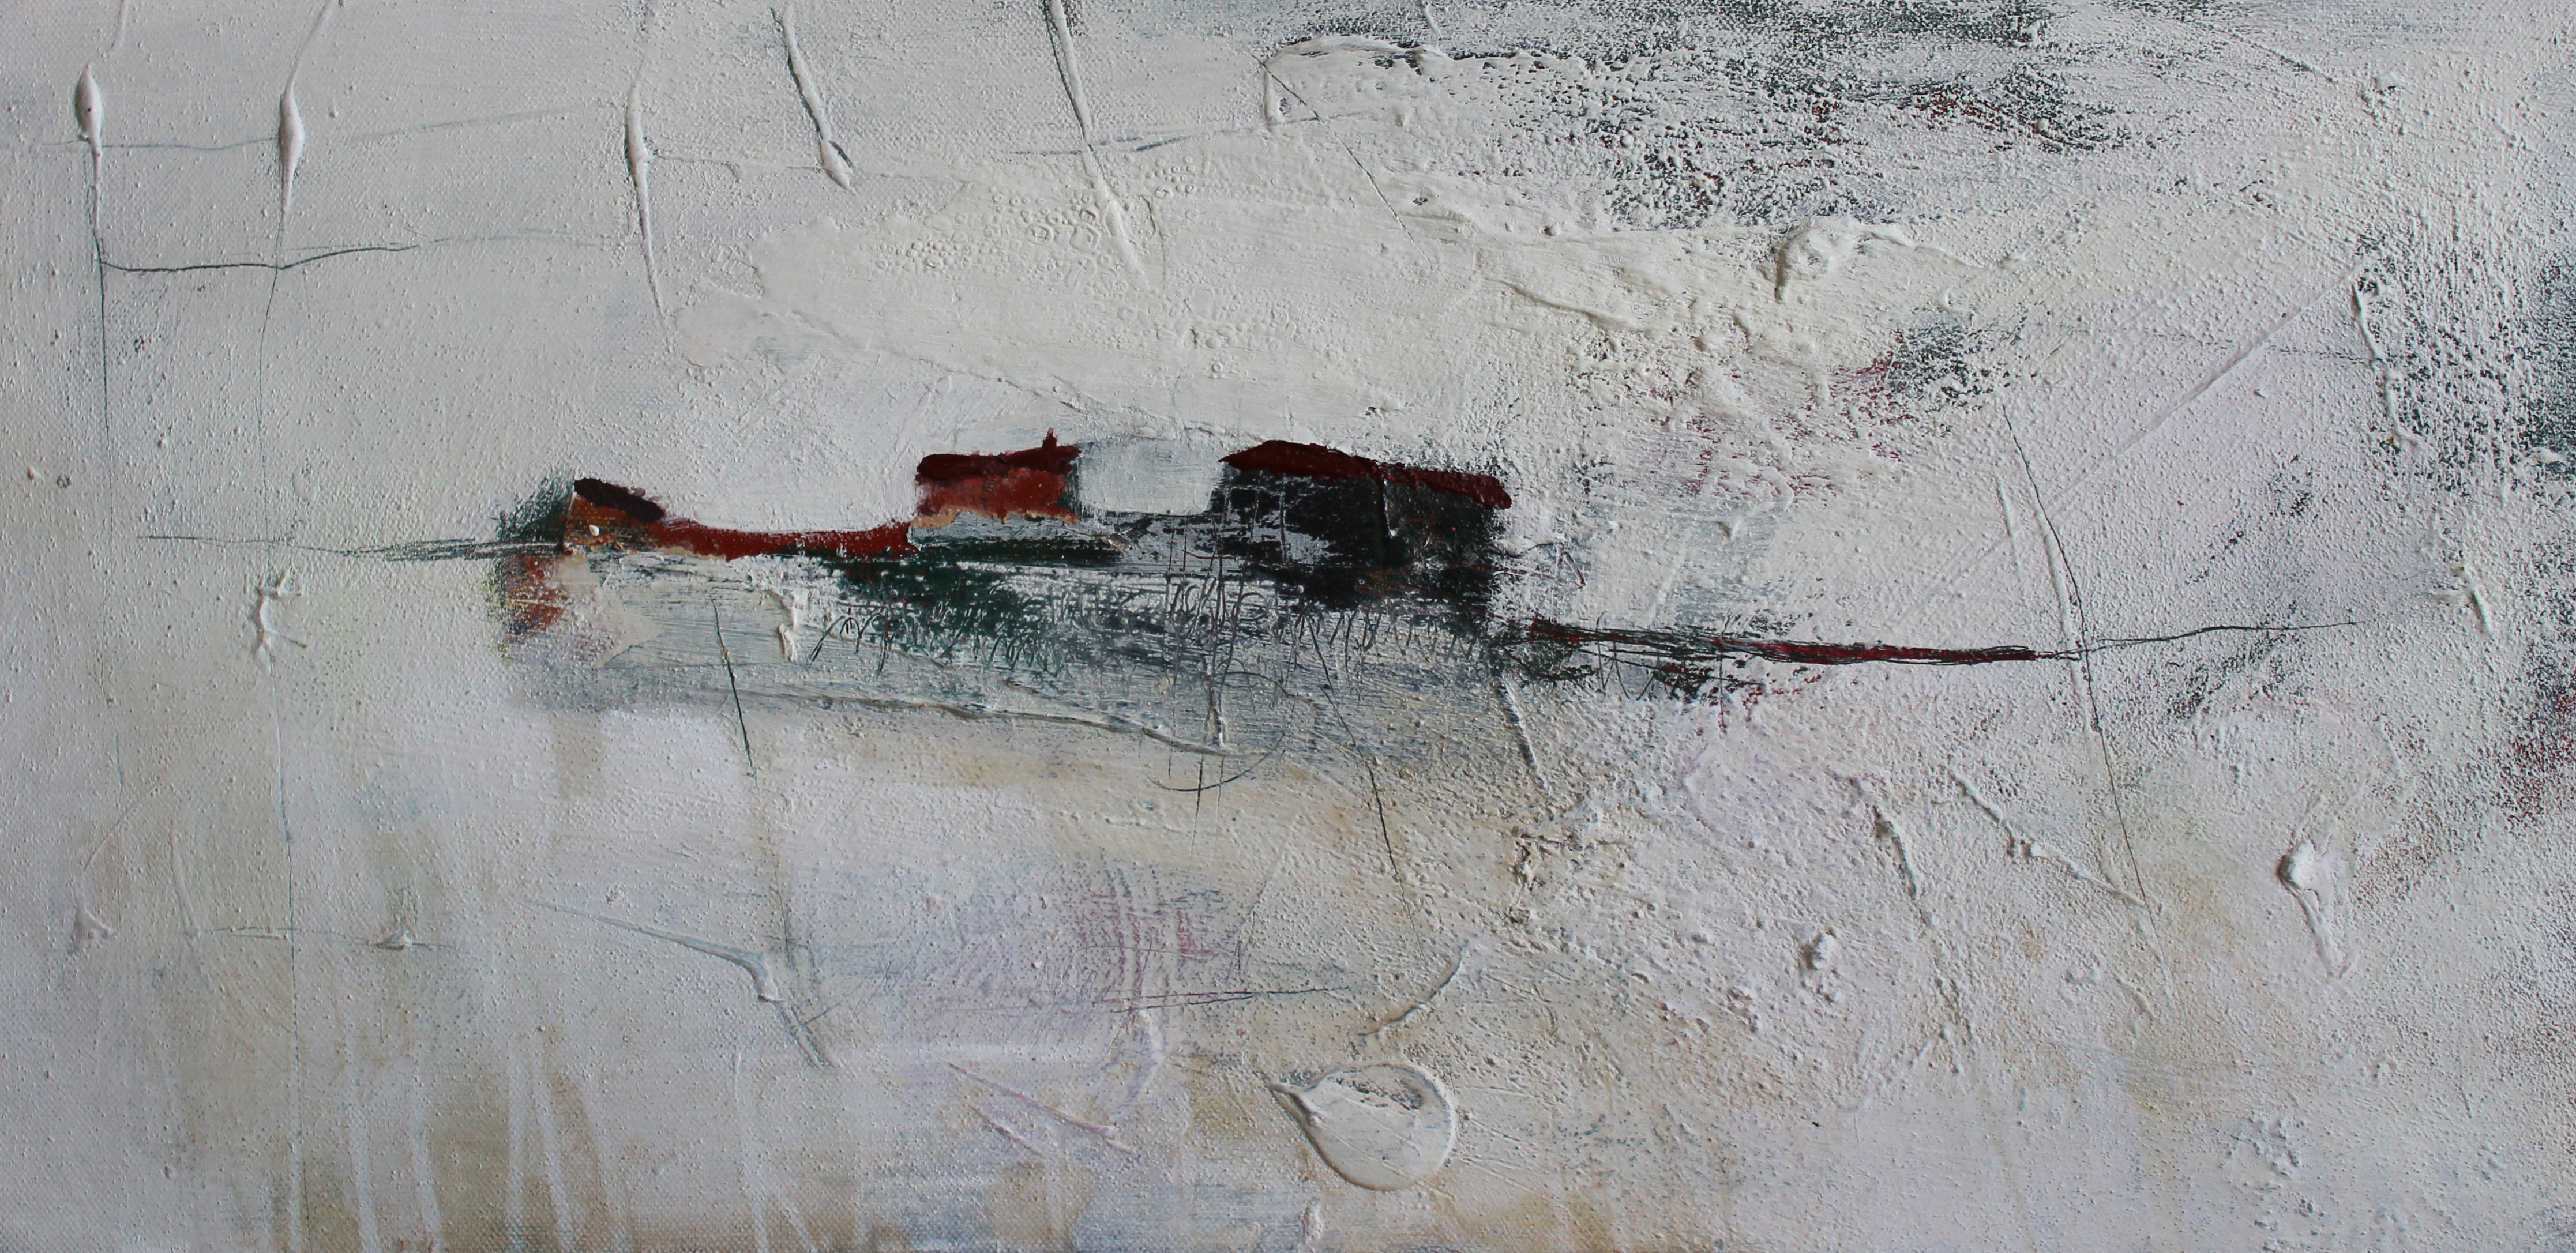 https://www.abstrakte-expressive-malerei.de/shop/